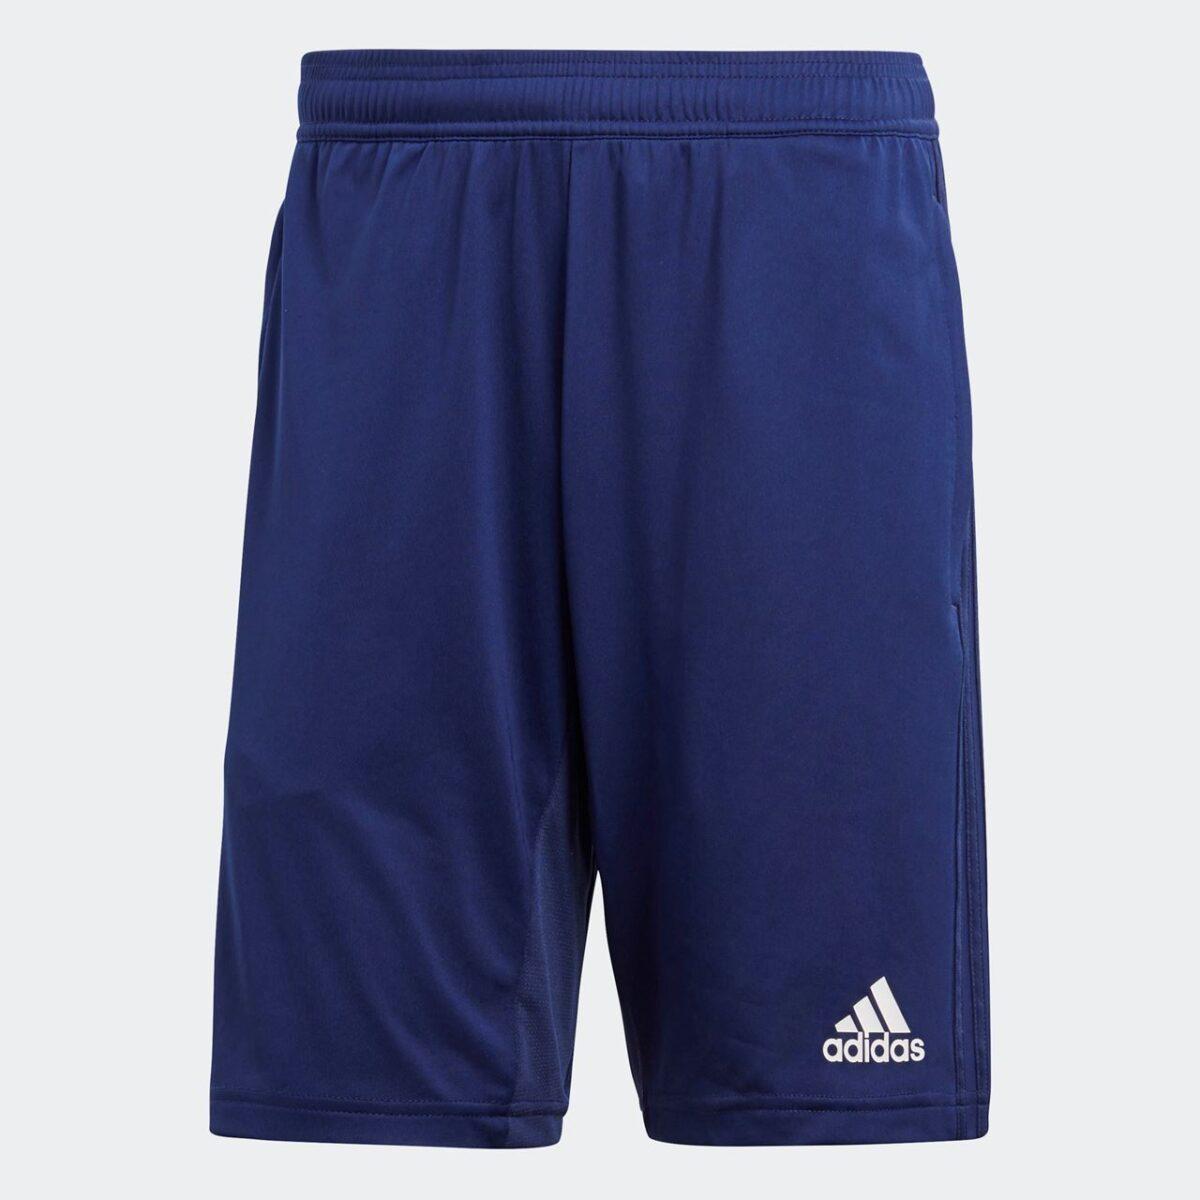 Adidas Condivo 18 Training Shorts Adult